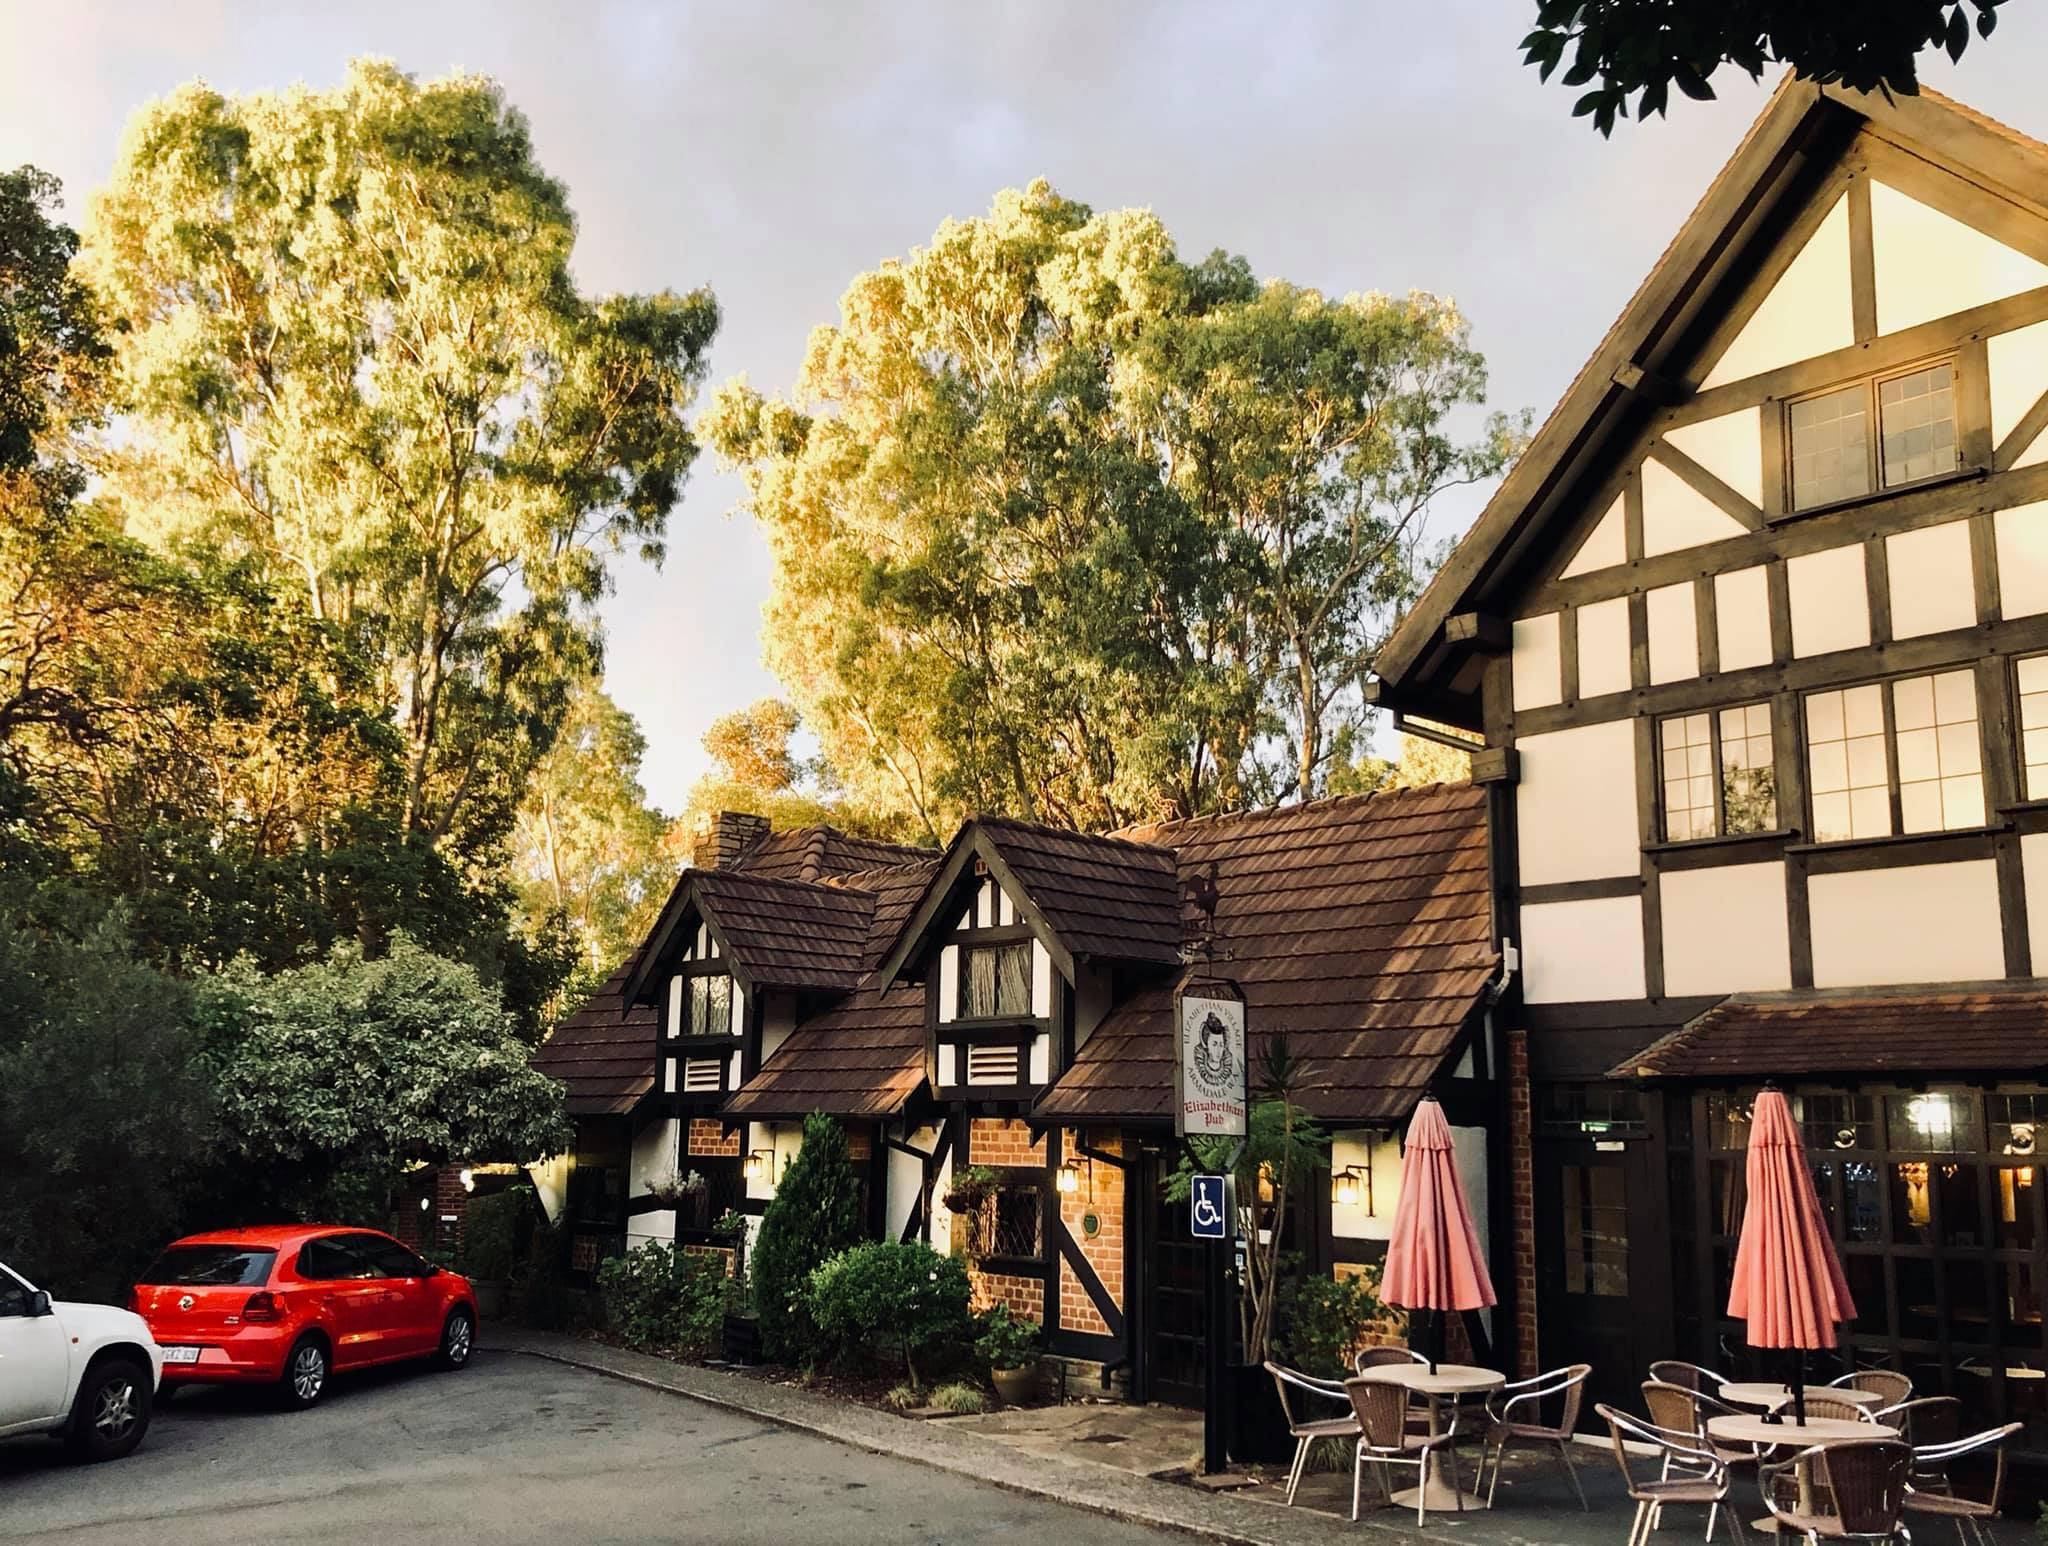 Heritage location -